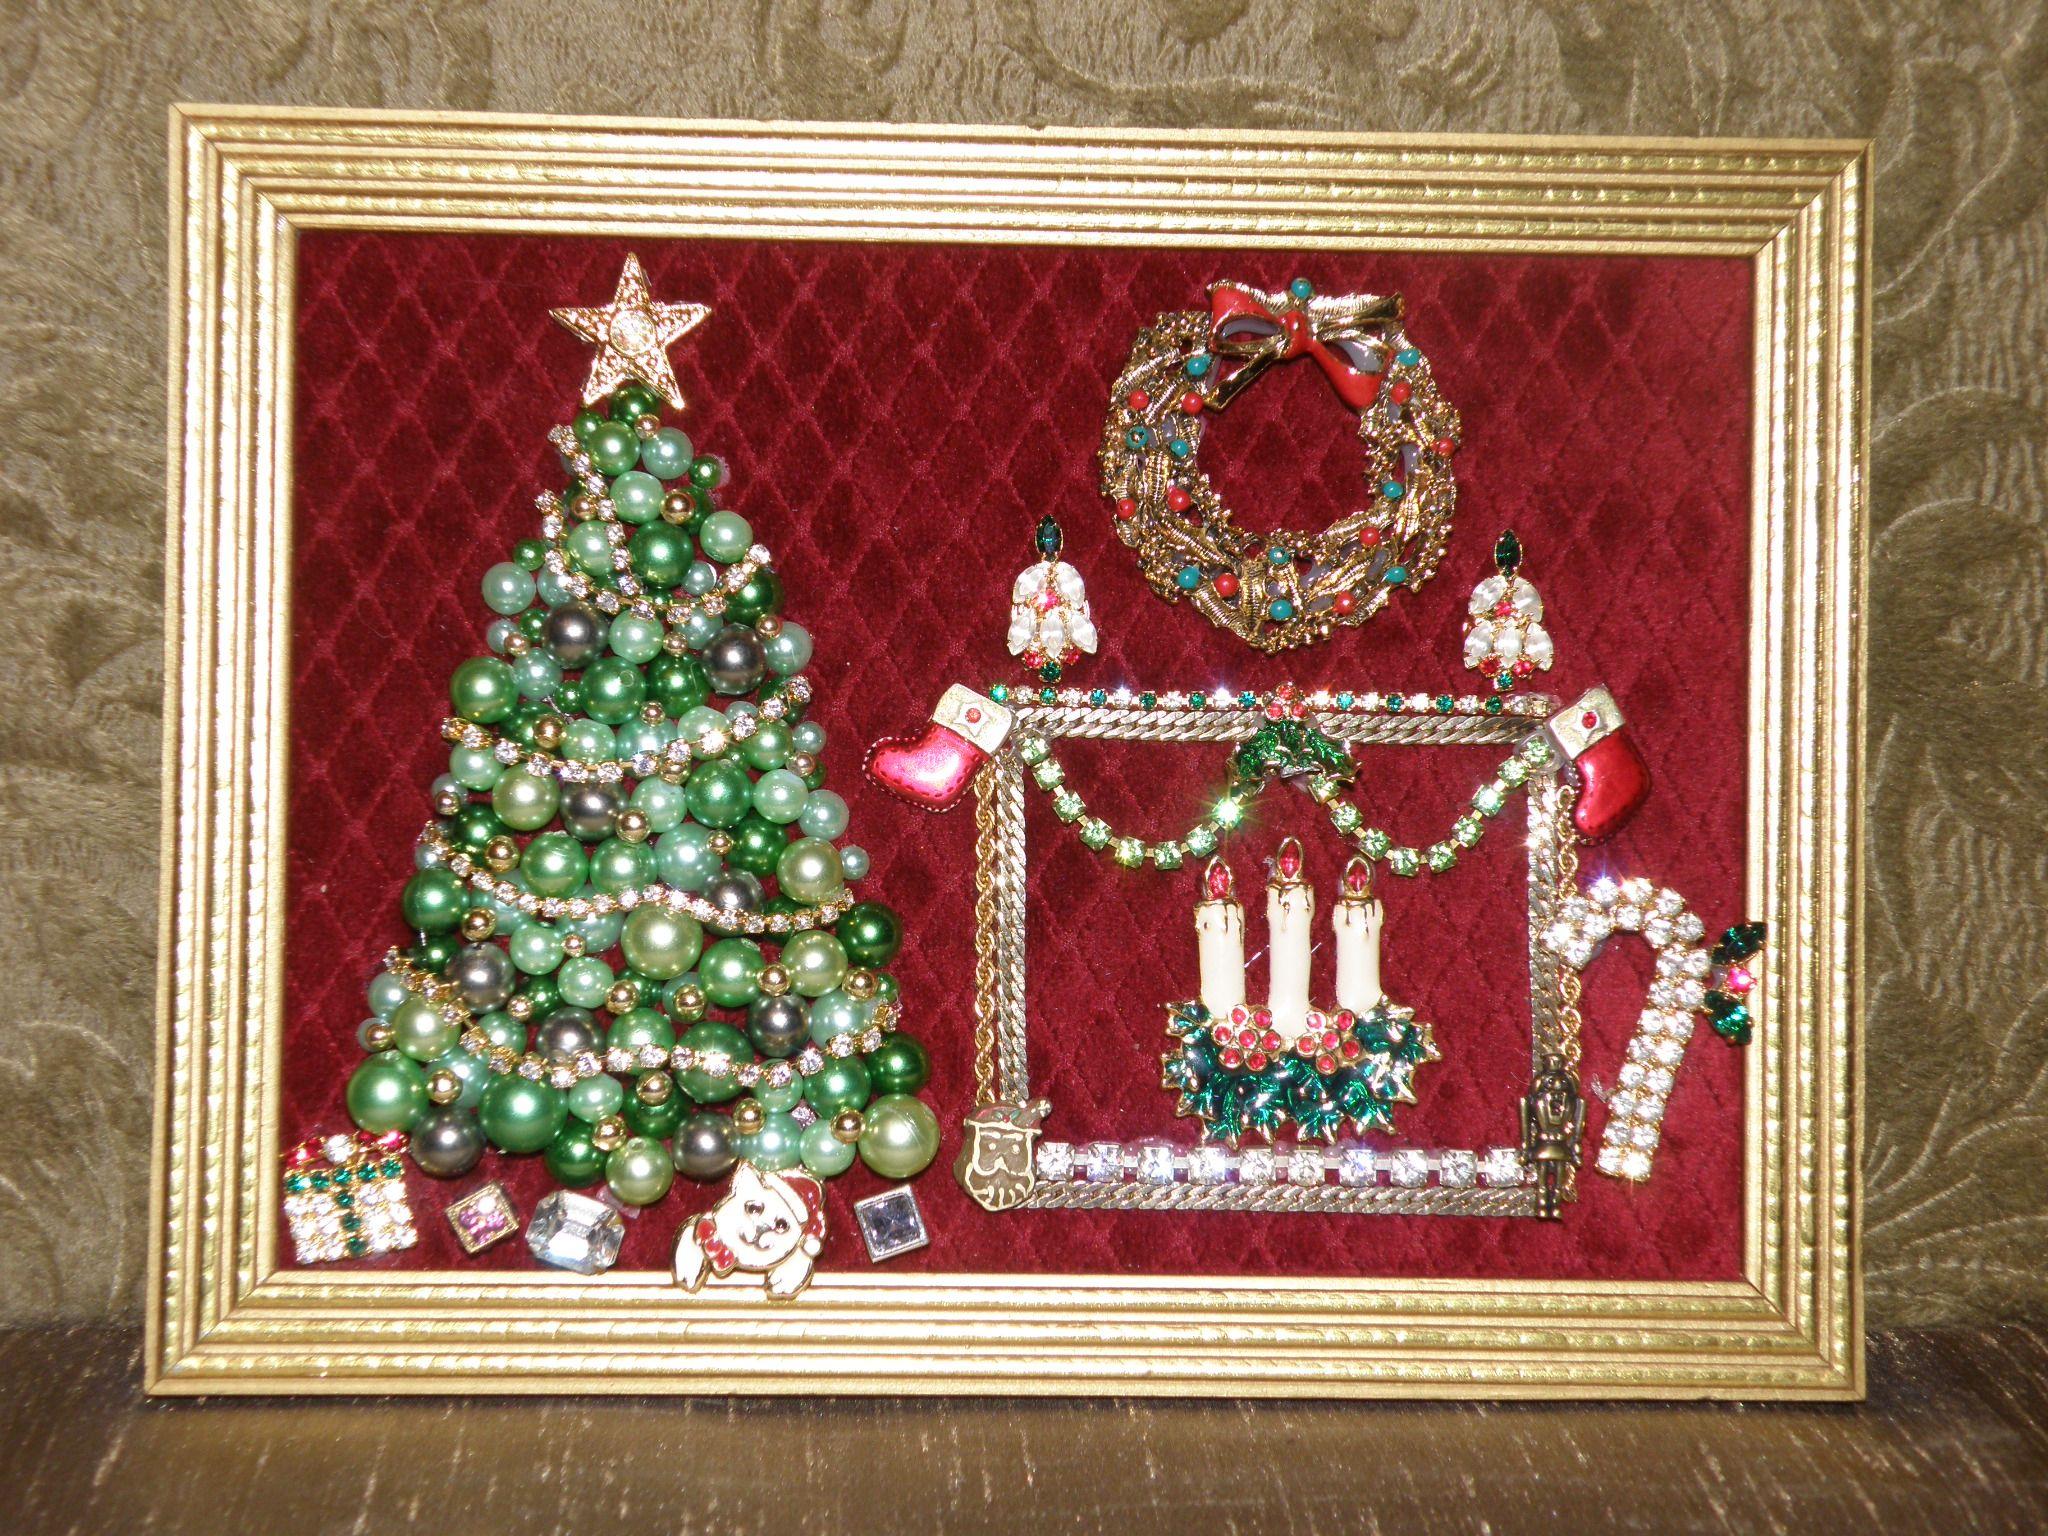 Vintage Jewelry Christmas Tree & Fireplace Scene | Jewelry Art in ...